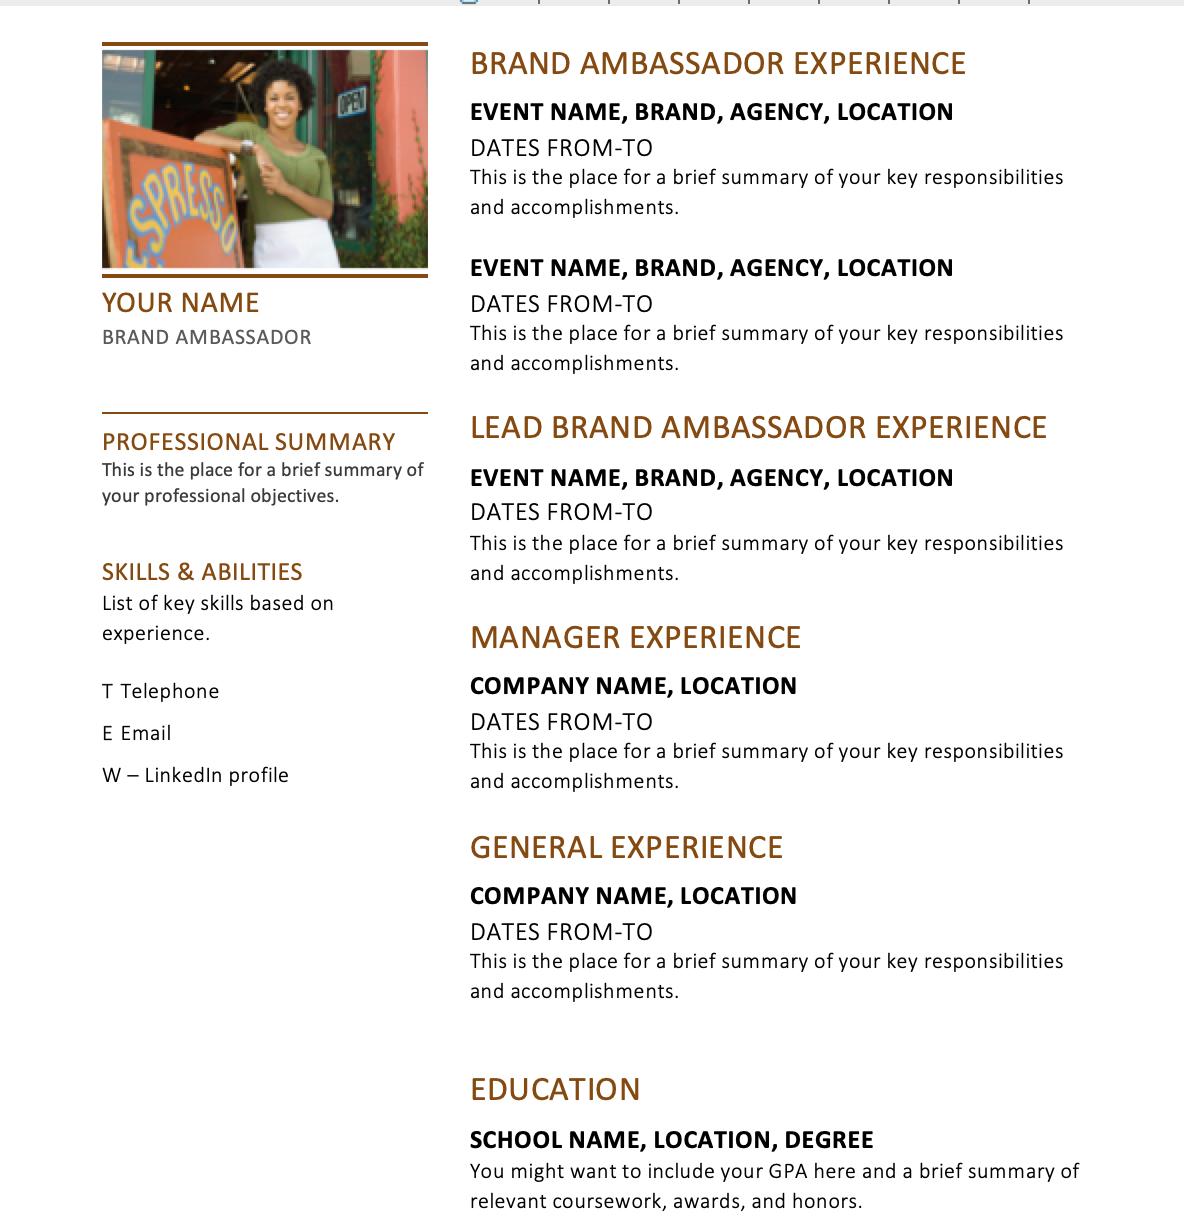 25 Brand Ambassador Resume Tips Resume tips, Brand